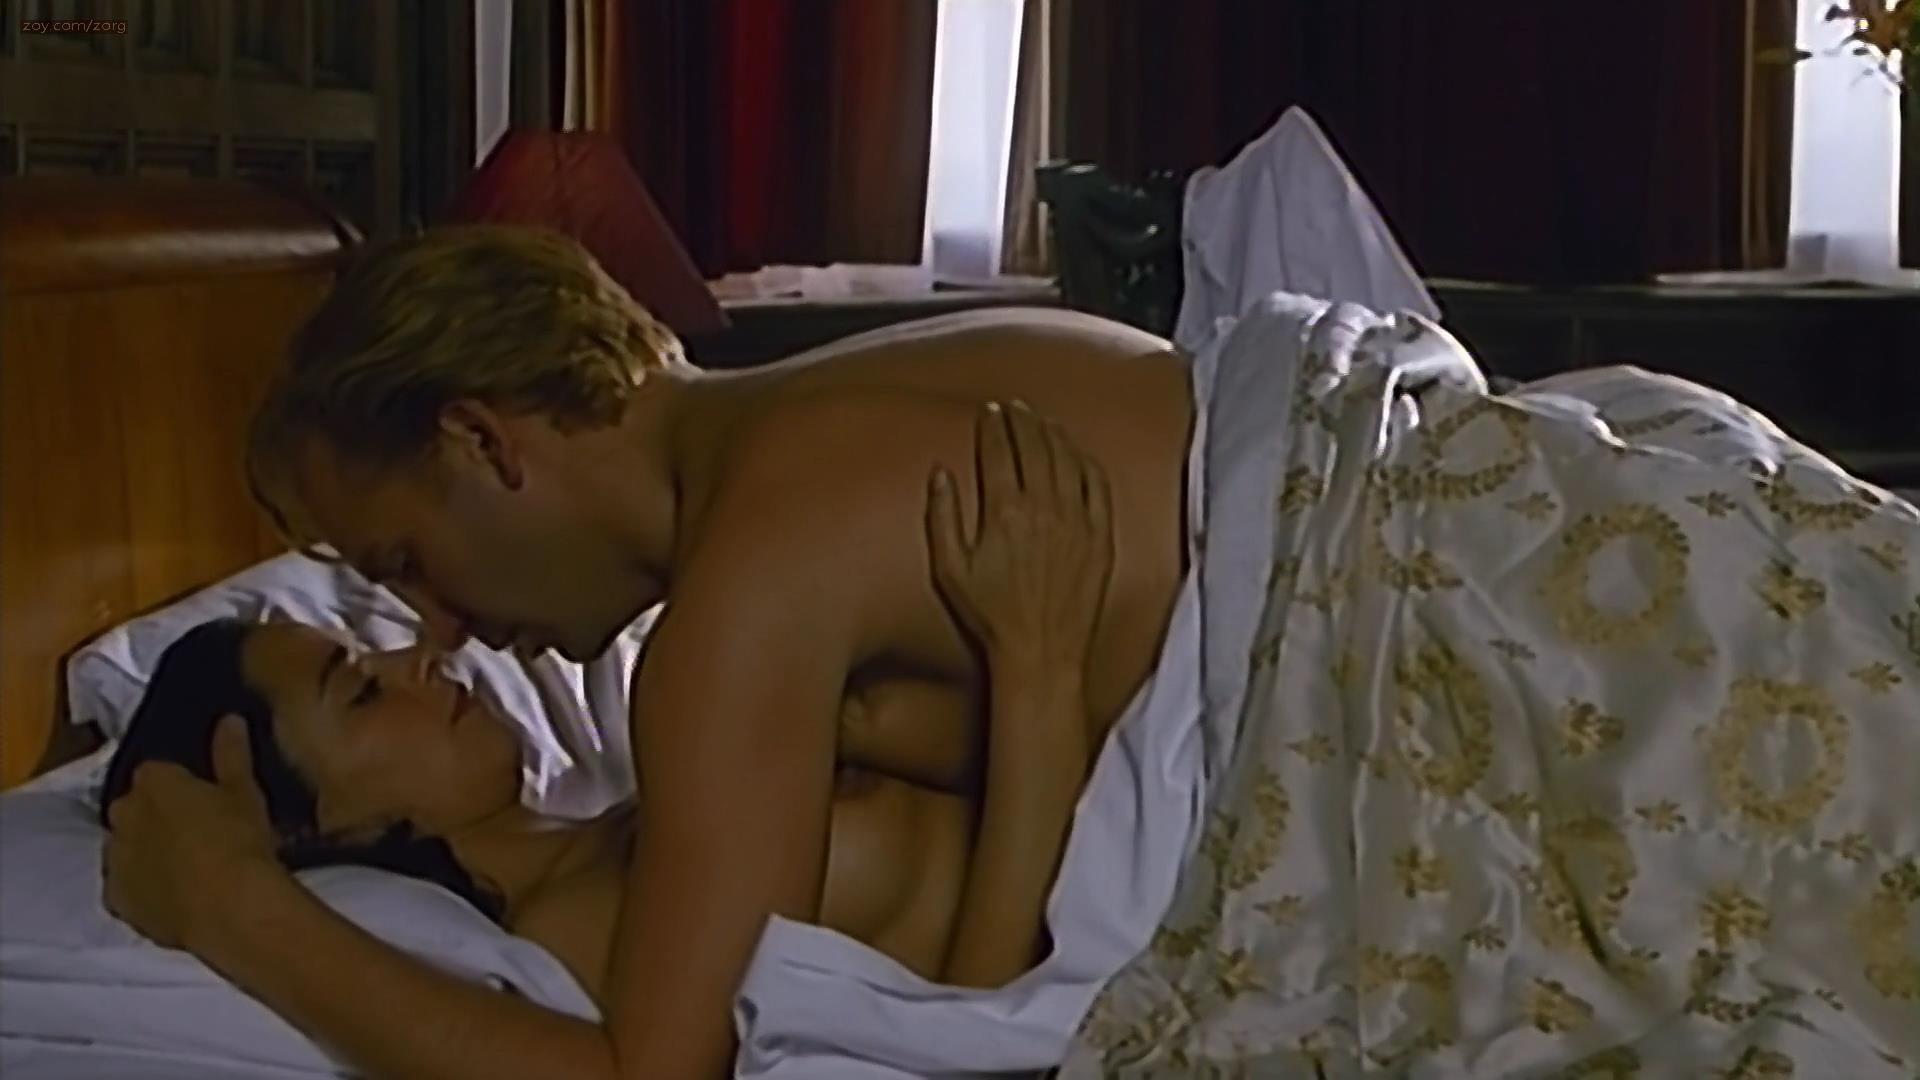 Anja Ali Samantha Lesbian Porn els dottermans, elsie de brauw nude bush sex and lesbian